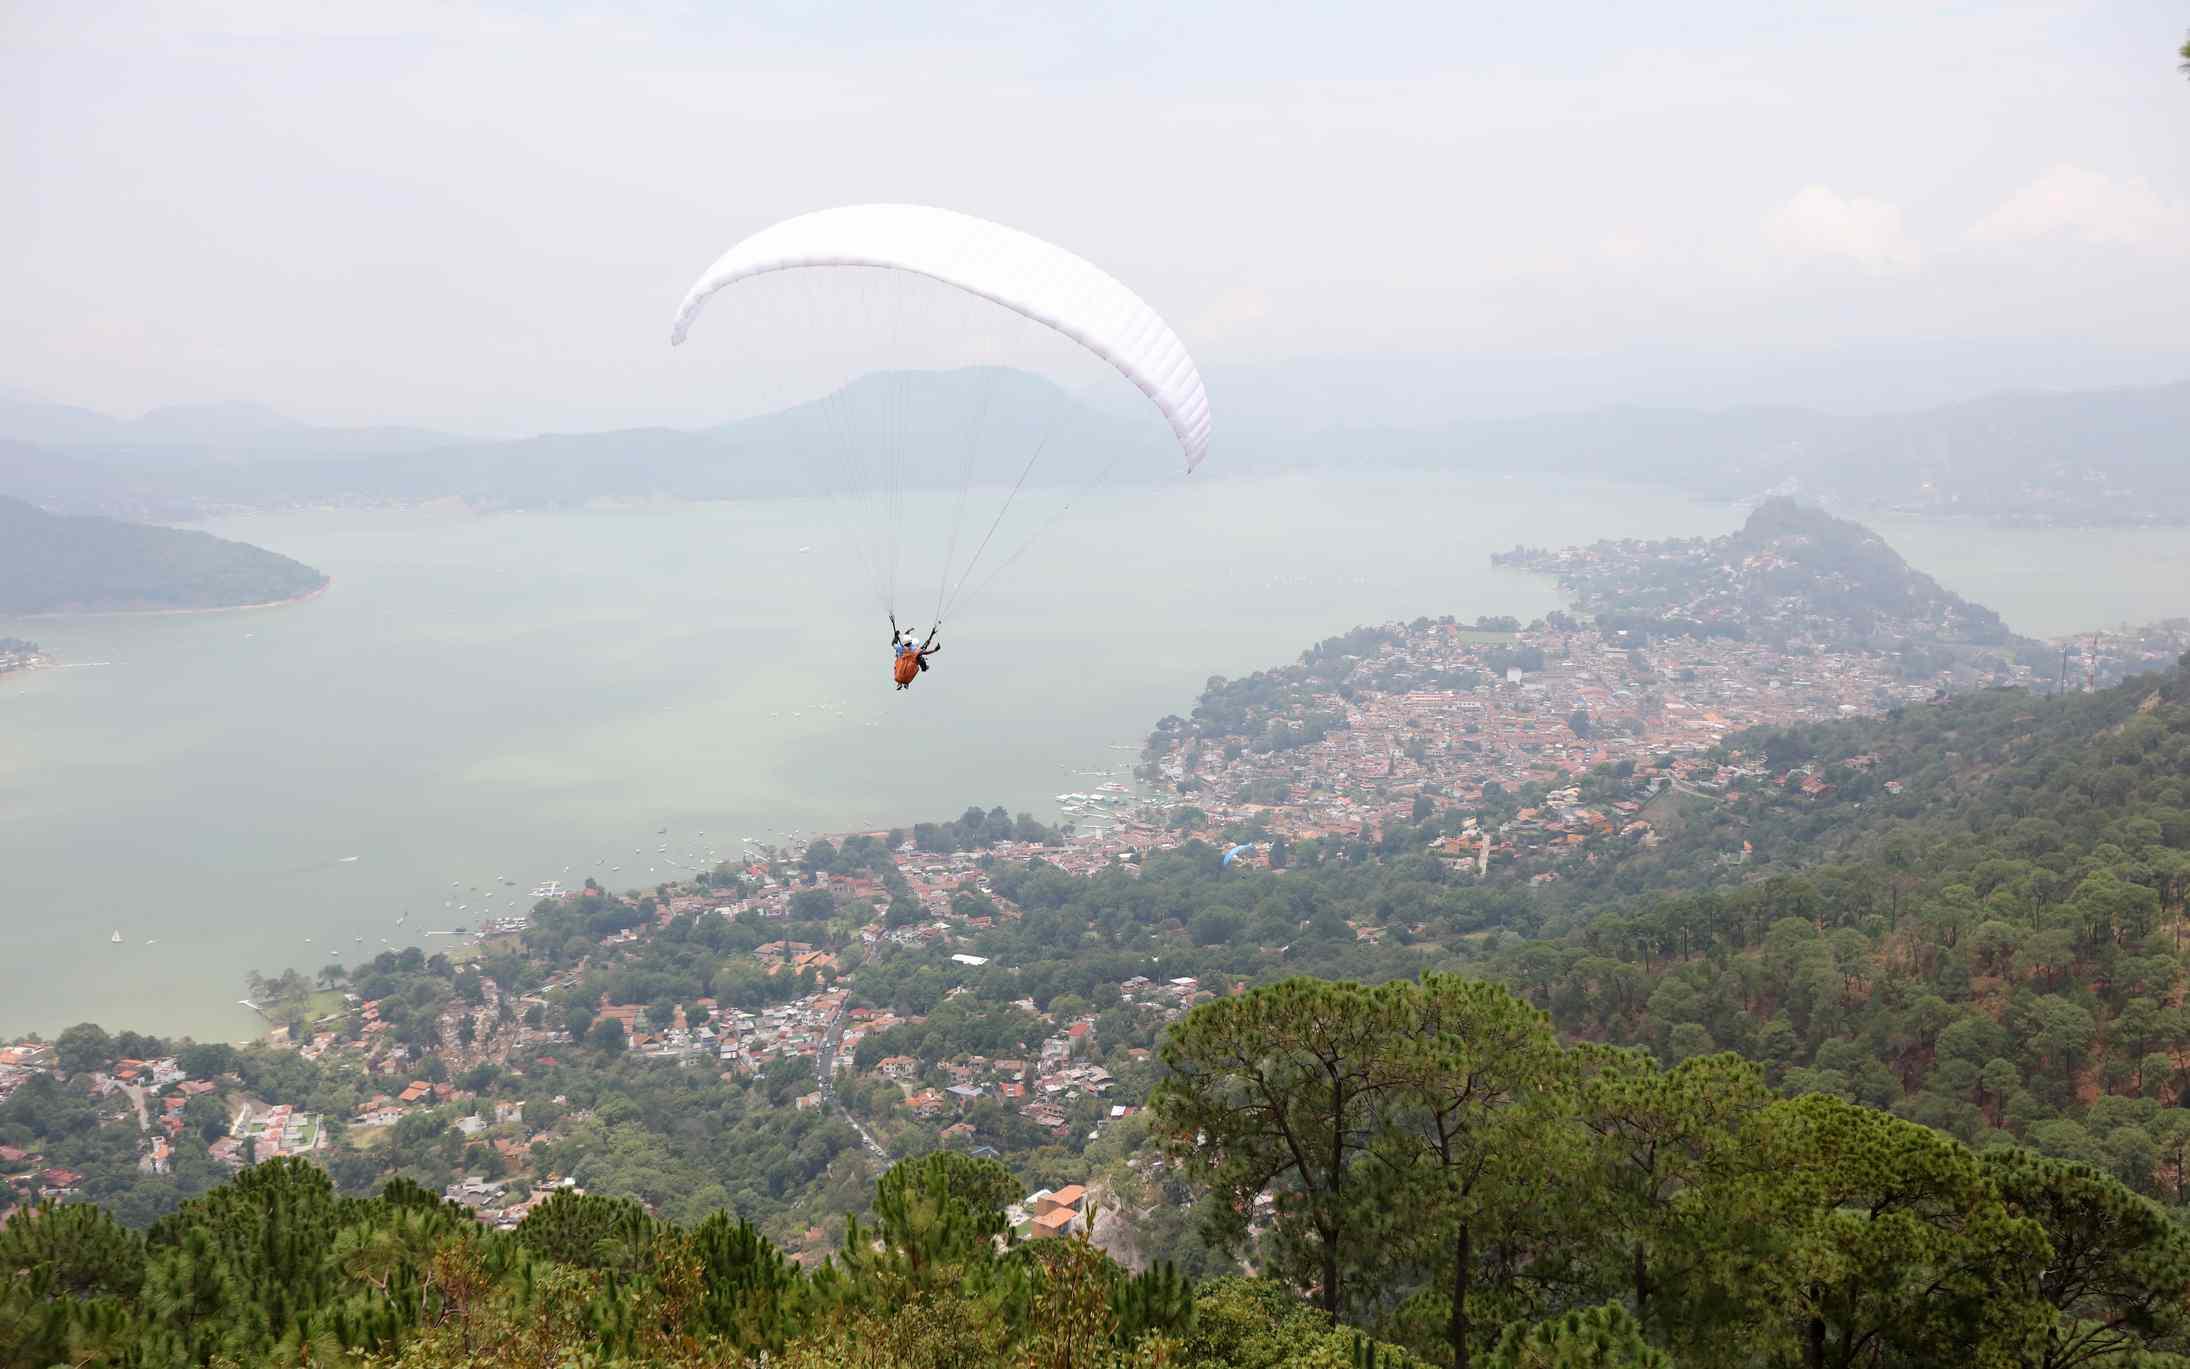 Valle de Bravo paragliding